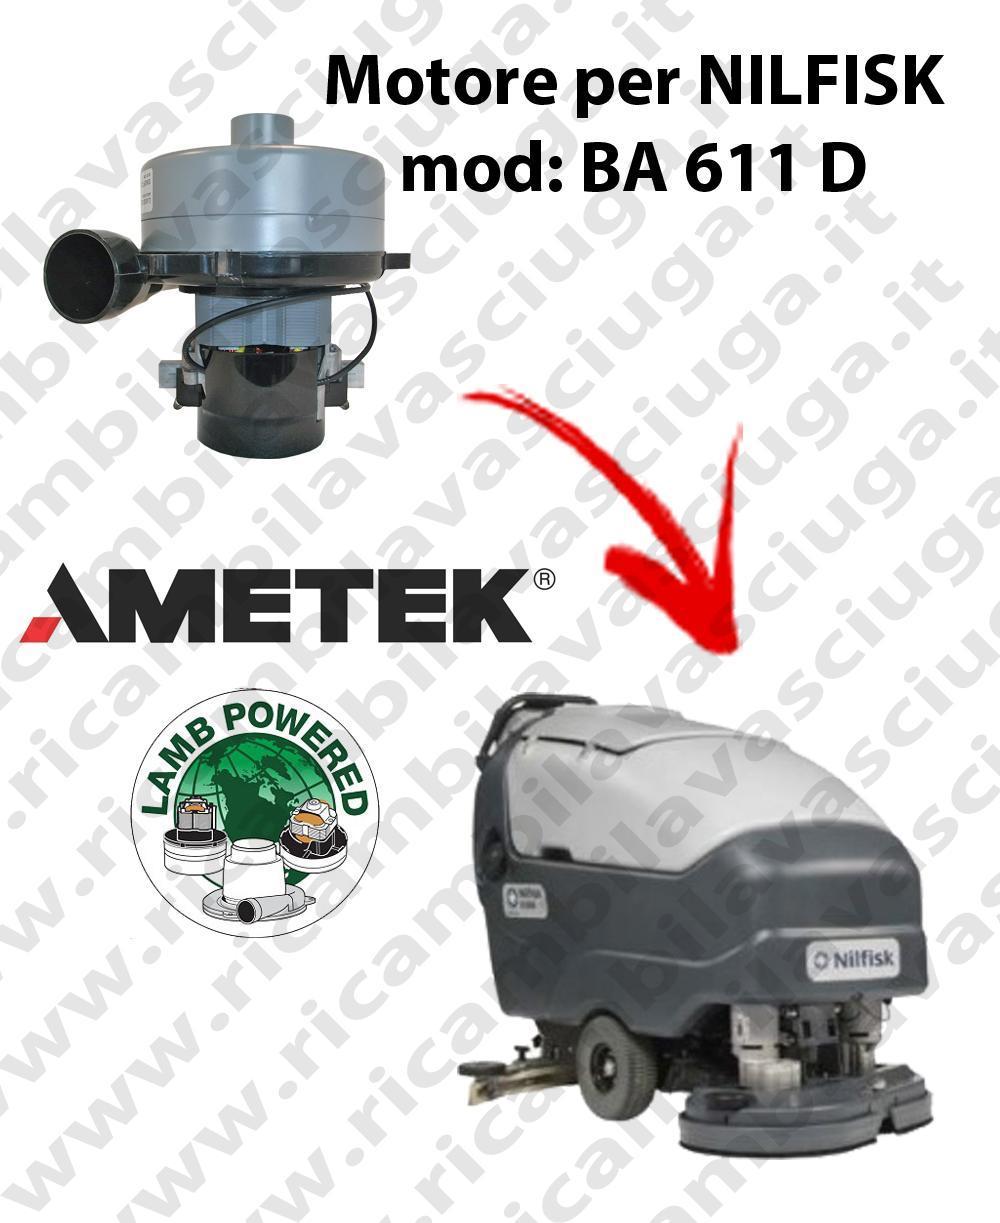 BA 611 D Vacuum motor LAMB AMETEK for scrubber dryer NILFISK